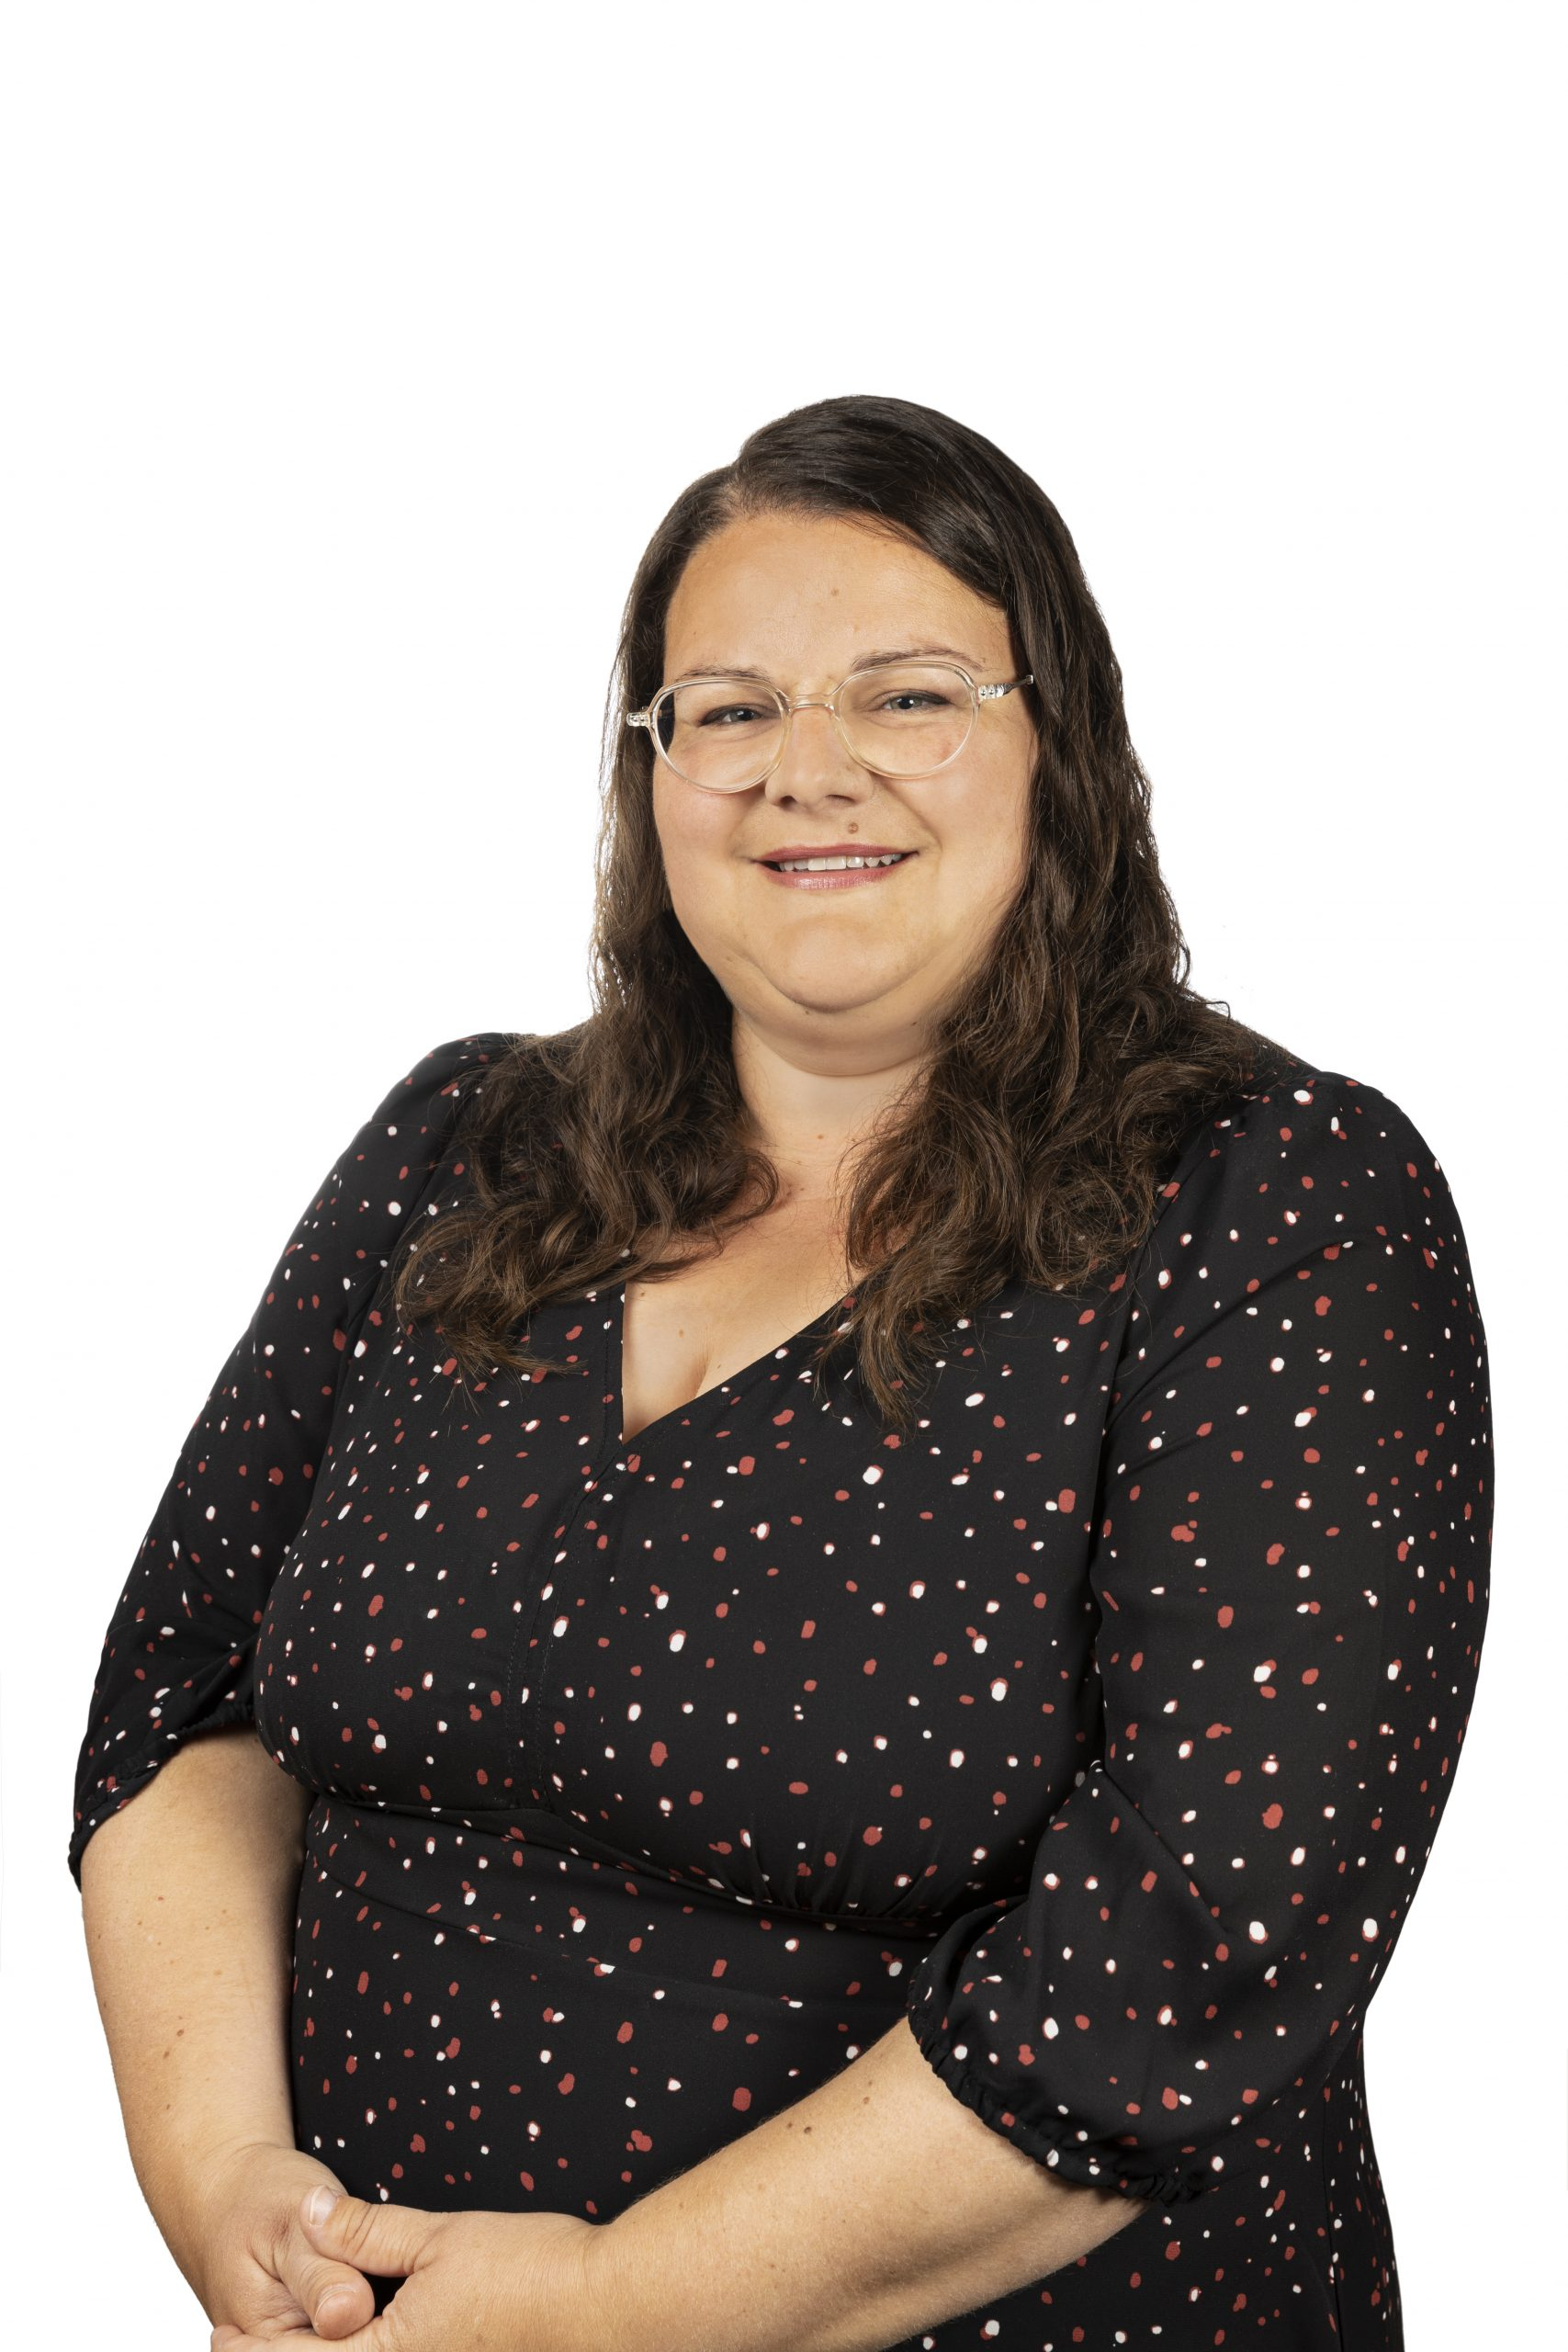 Mélanie Nadeau